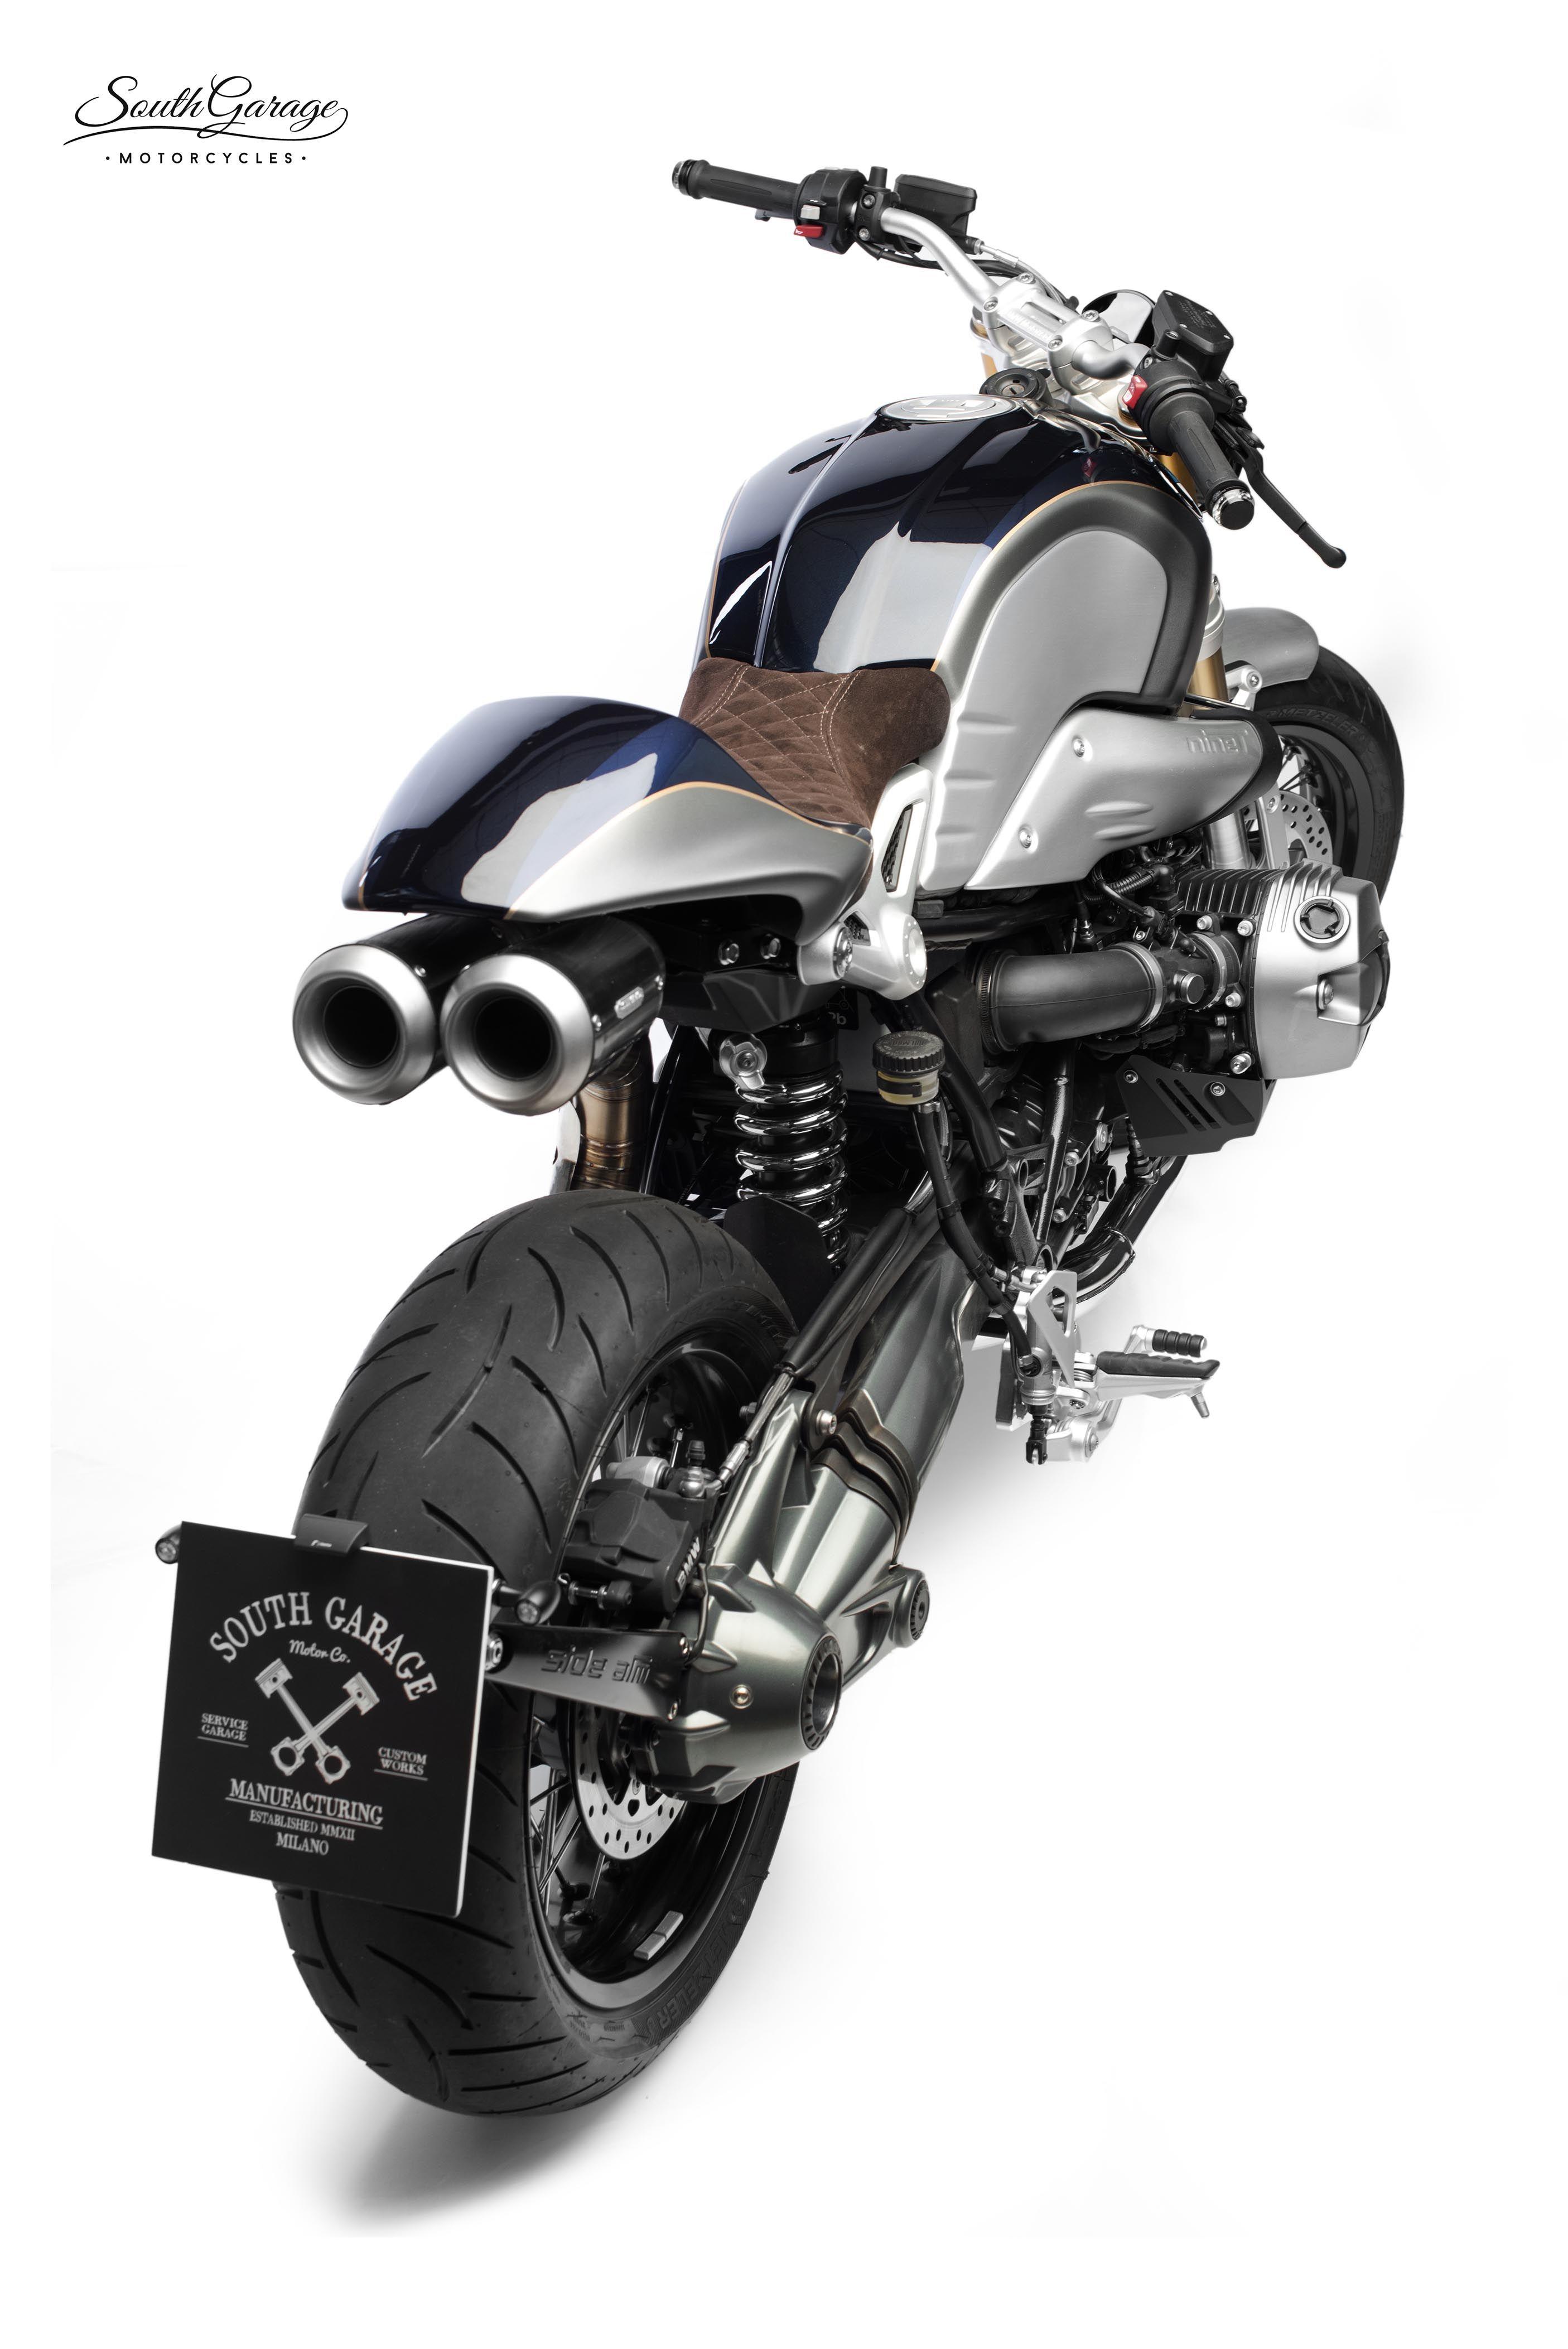 faust south garage motor co bikes caaaaaaars pinterest moto voitures et le desir. Black Bedroom Furniture Sets. Home Design Ideas